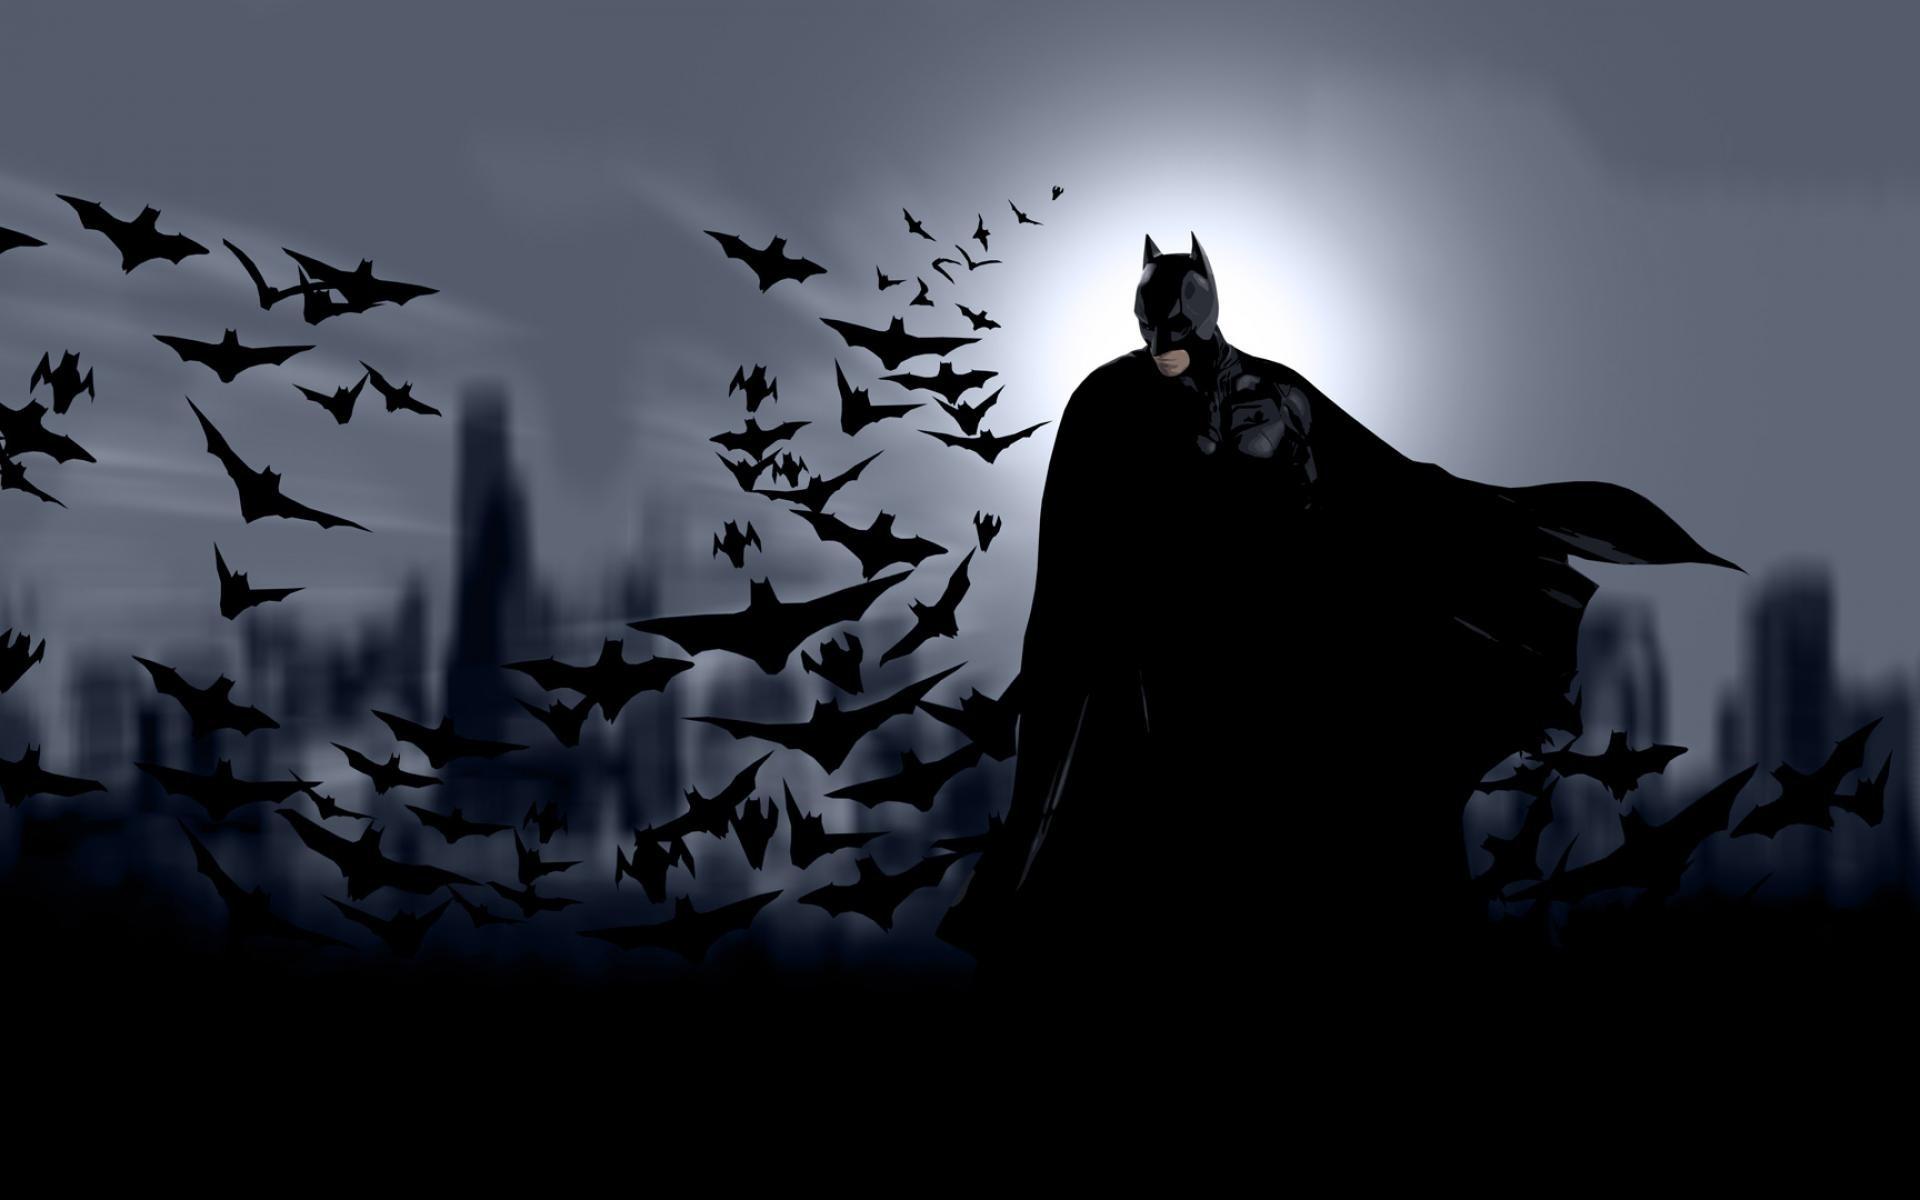 batman wallpapers hd desktop and mac – InspirePix